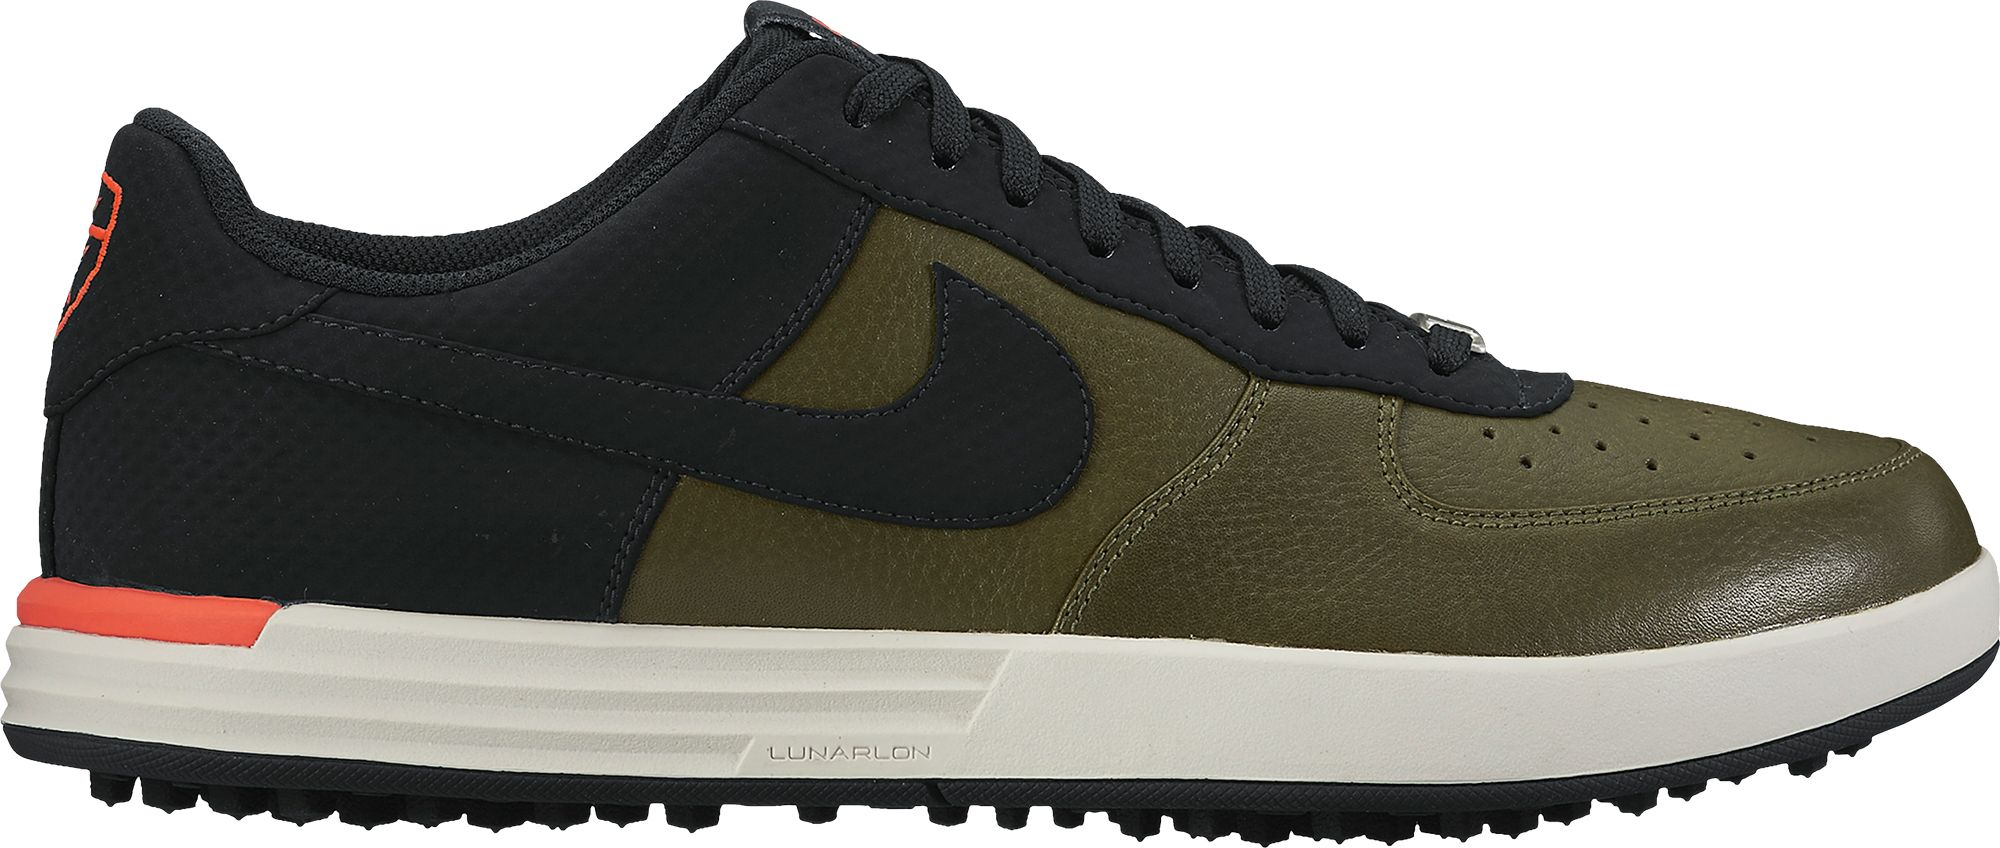 Nike Lunar Force 1 Golf Shoes